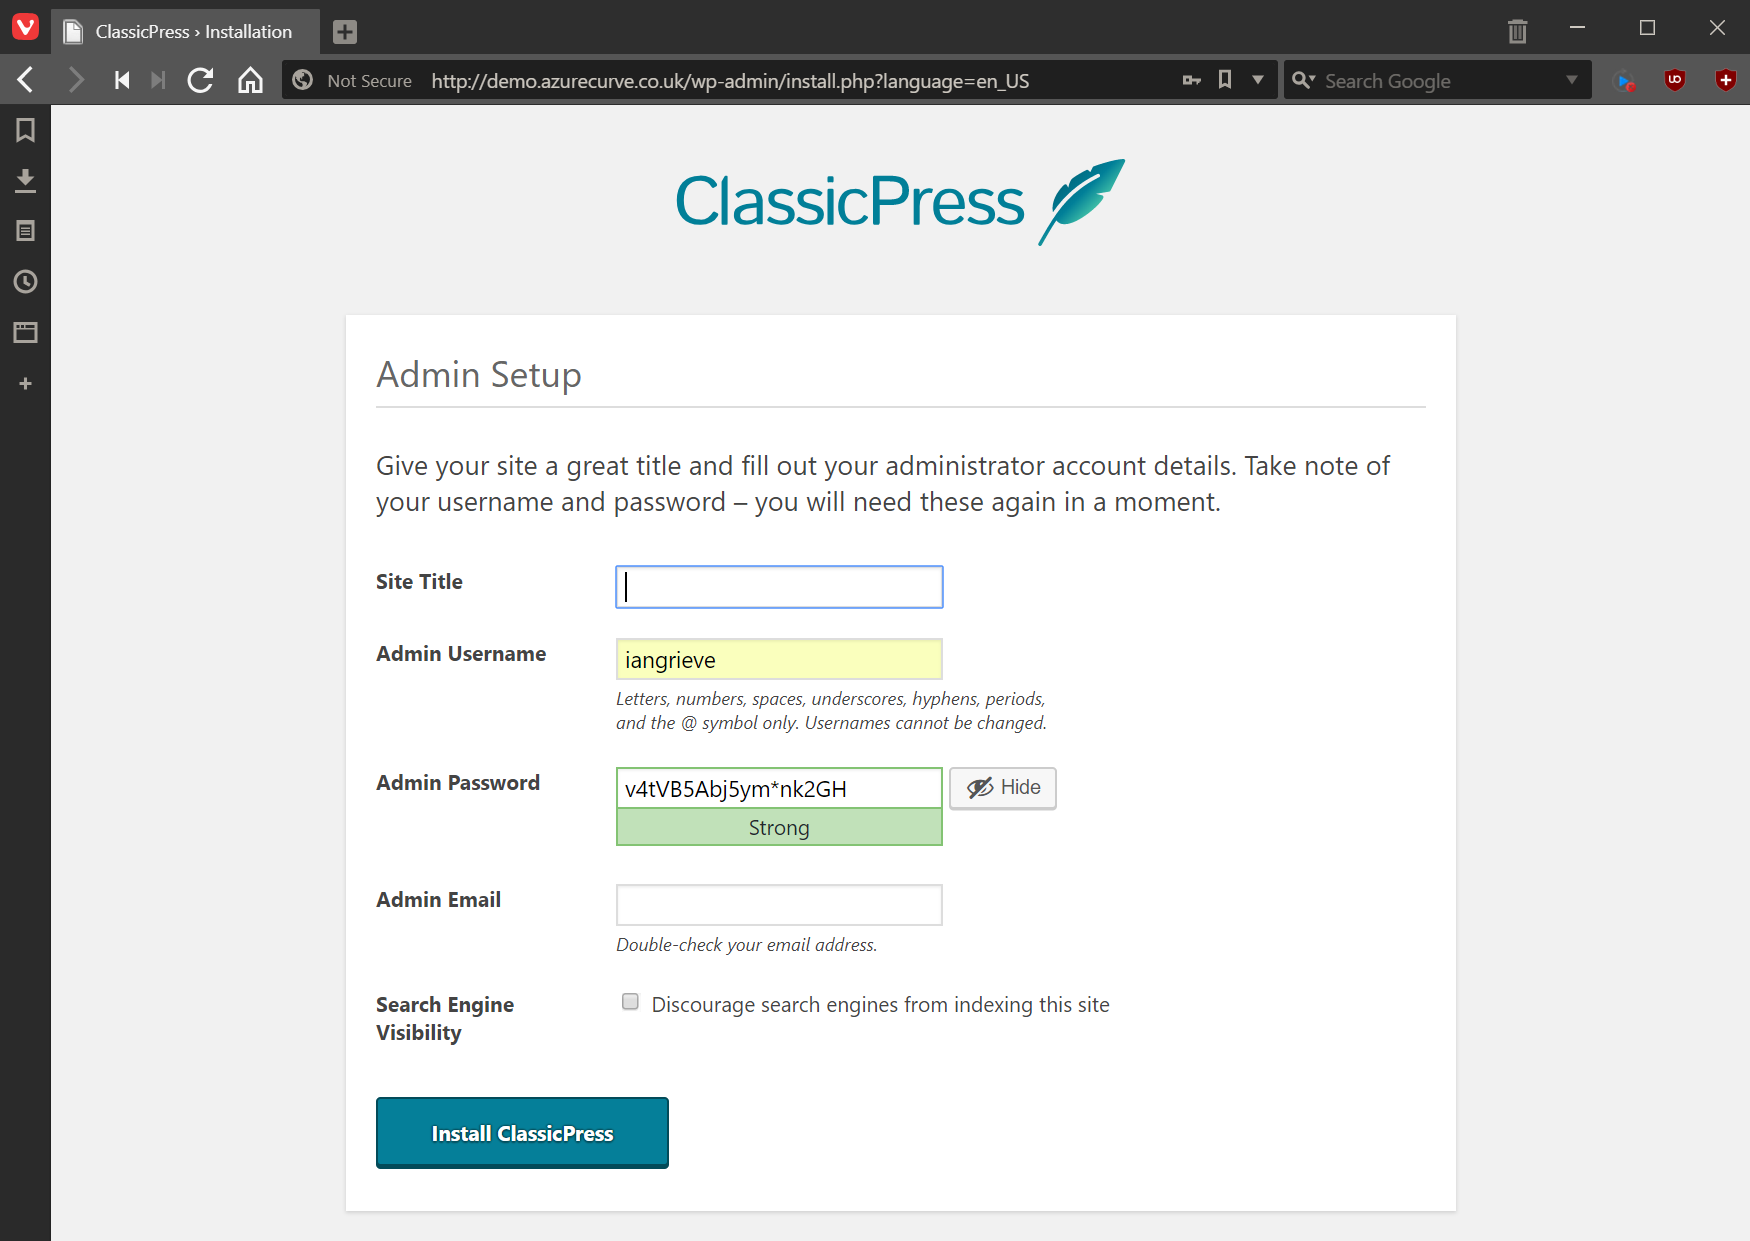 Admin Setup page